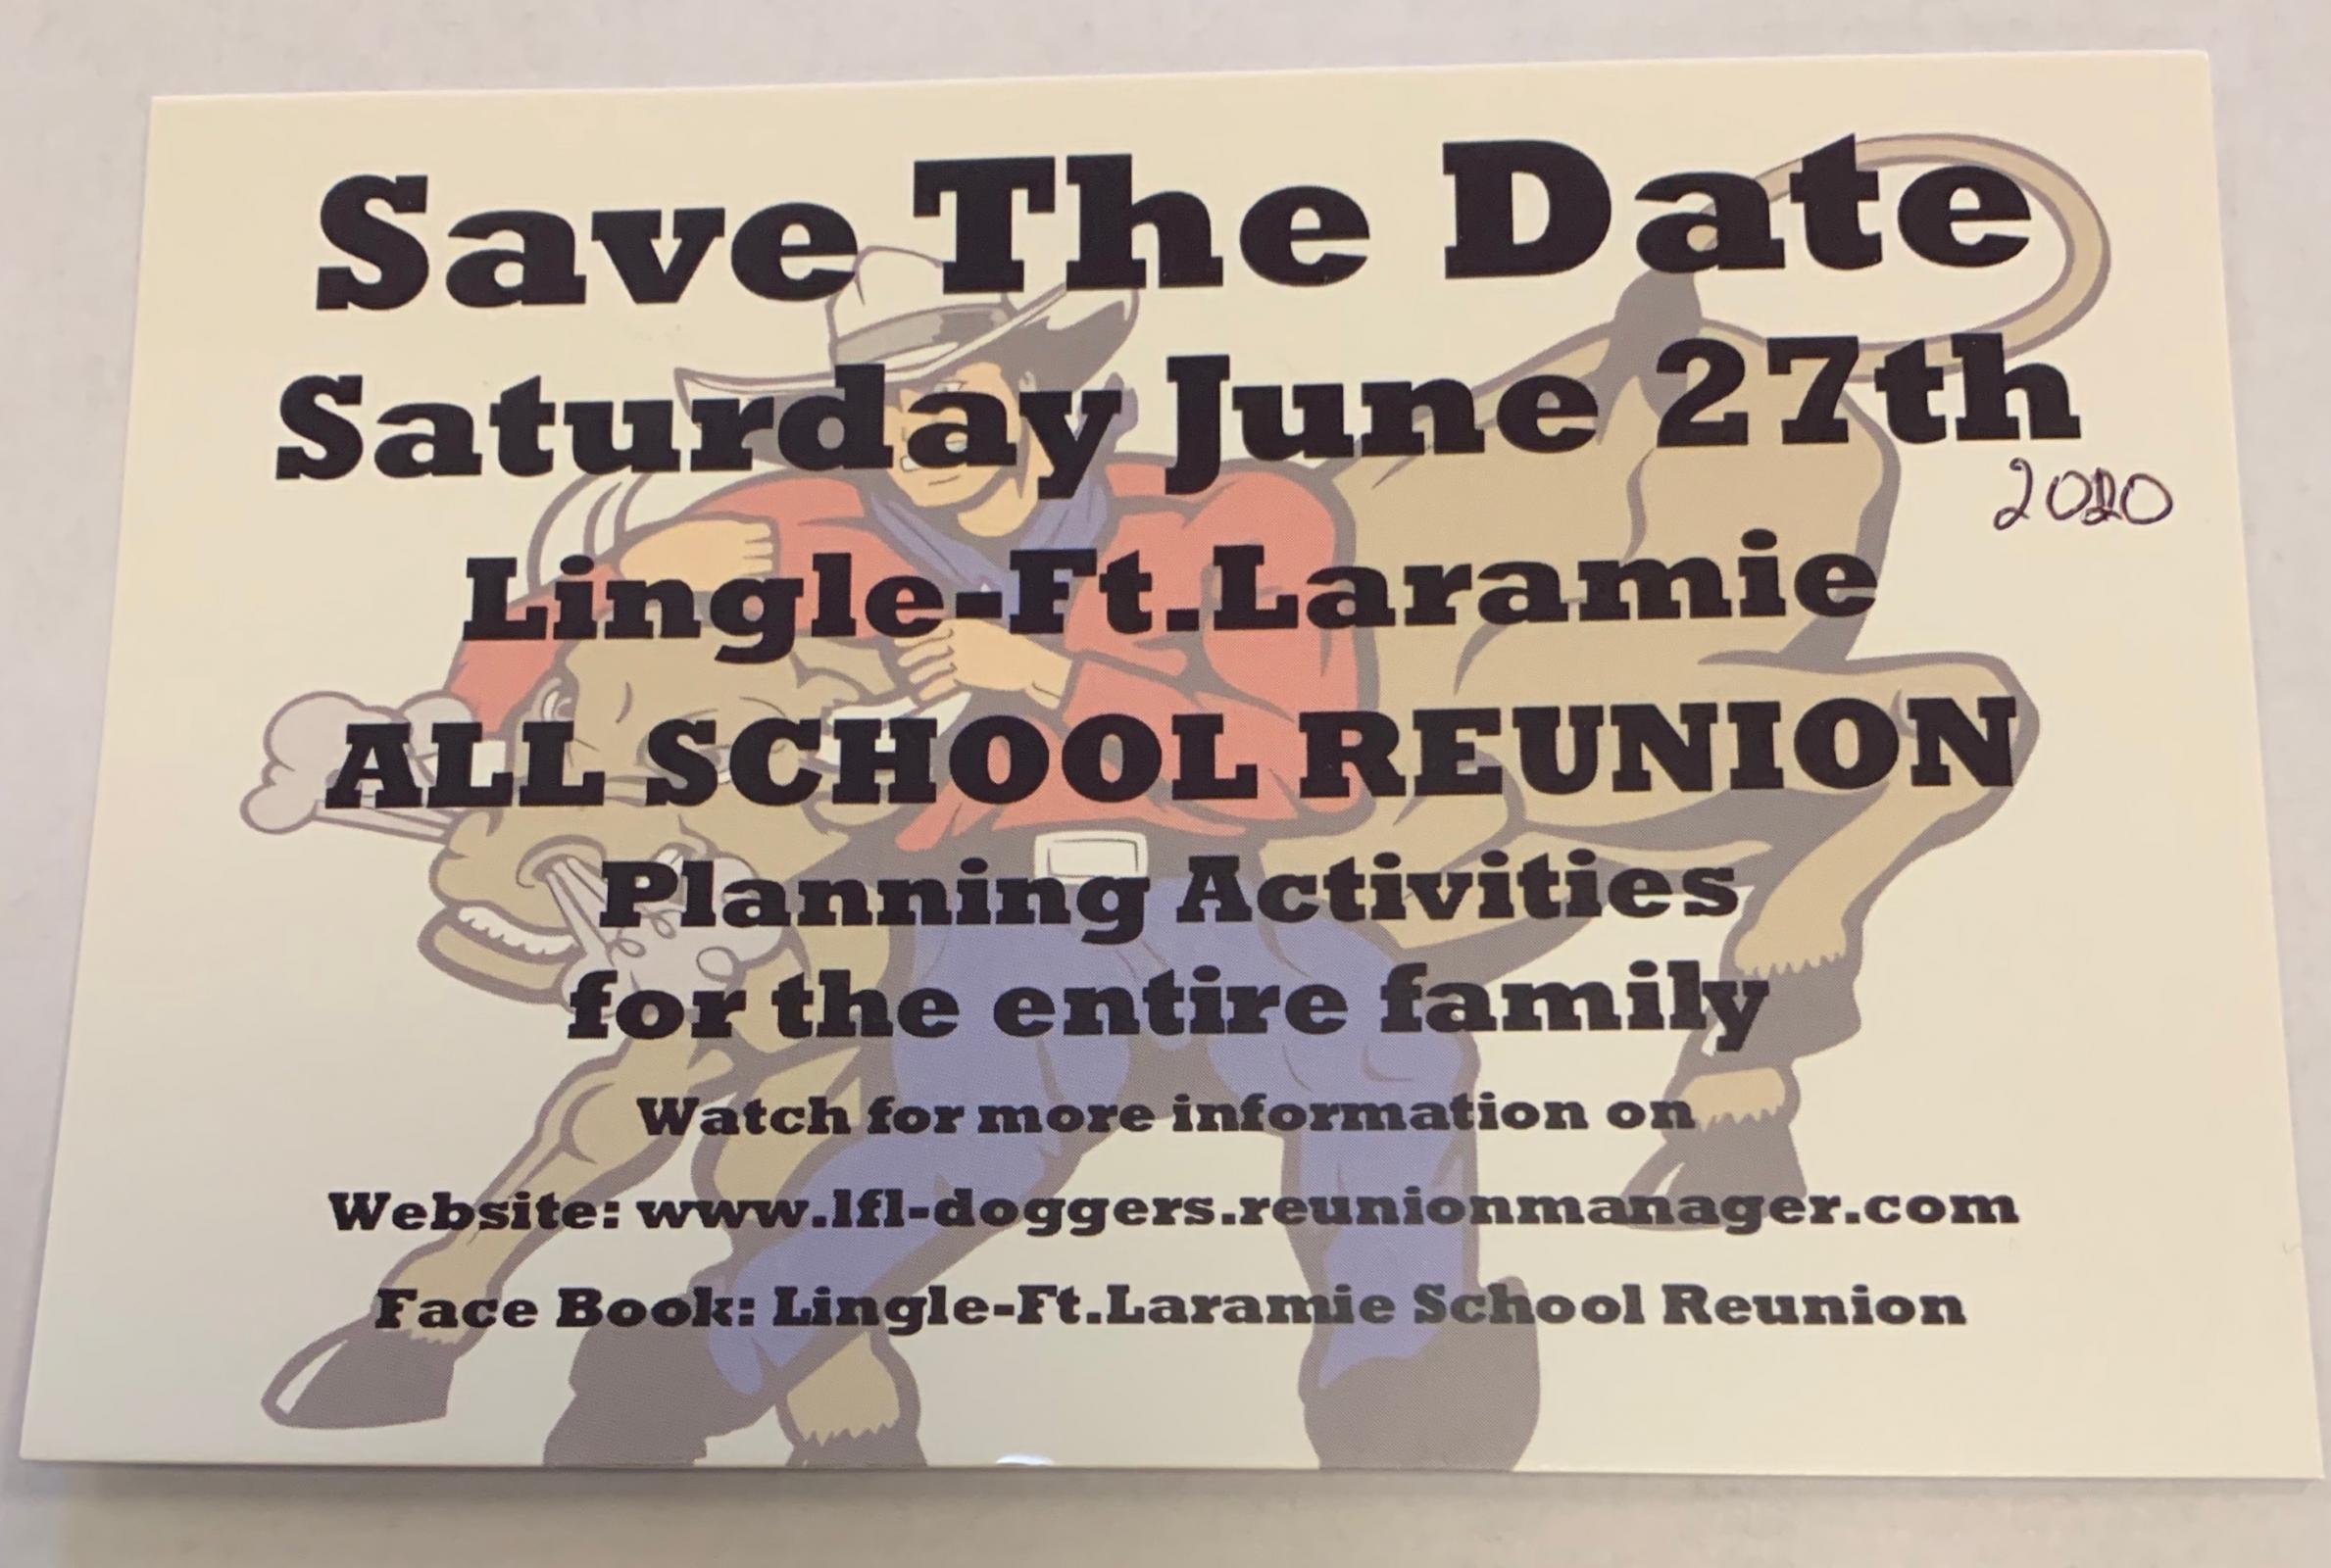 Lingle-Ft. Laramie All School Reunion Photo